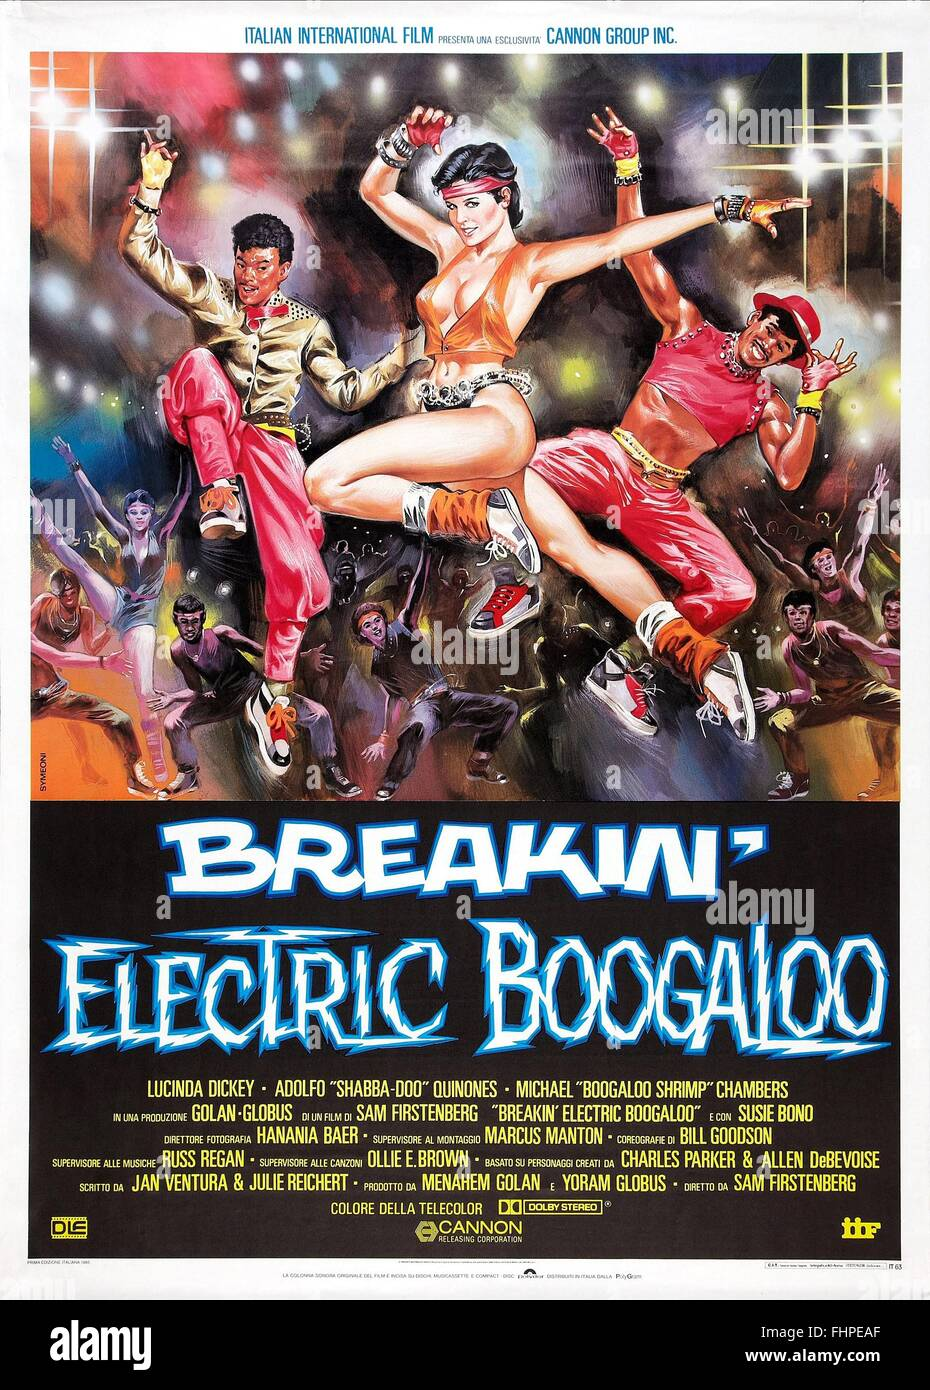 MICHAEL CHAMBERS LUCINDA DICKEY & ADOLFO QUINONES POSTER BREAKIN' 2: ELECTRIC BOOGALOO (1984) - Stock Image